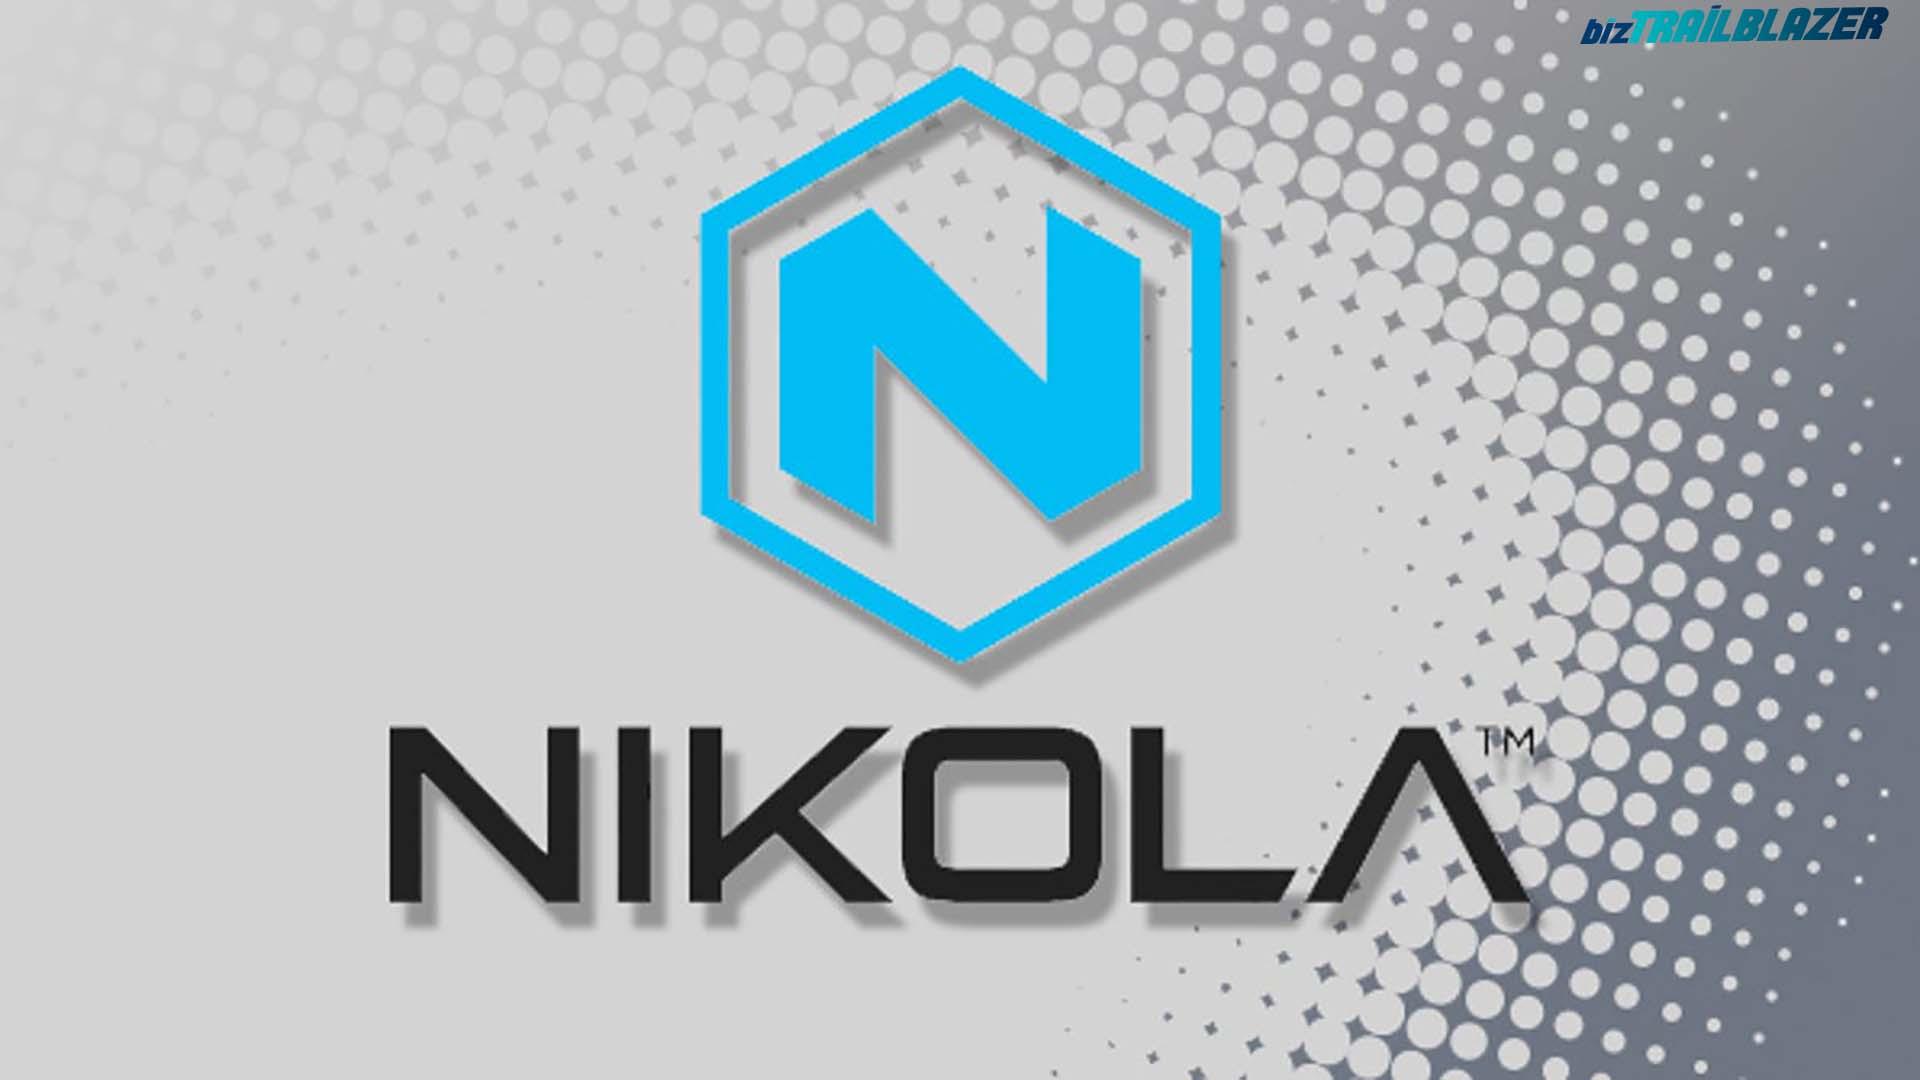 BizTrailBlazer-Blog-Trevor-Milton-Nikolas-Founder-Resigns-after-Fraud-Accusations